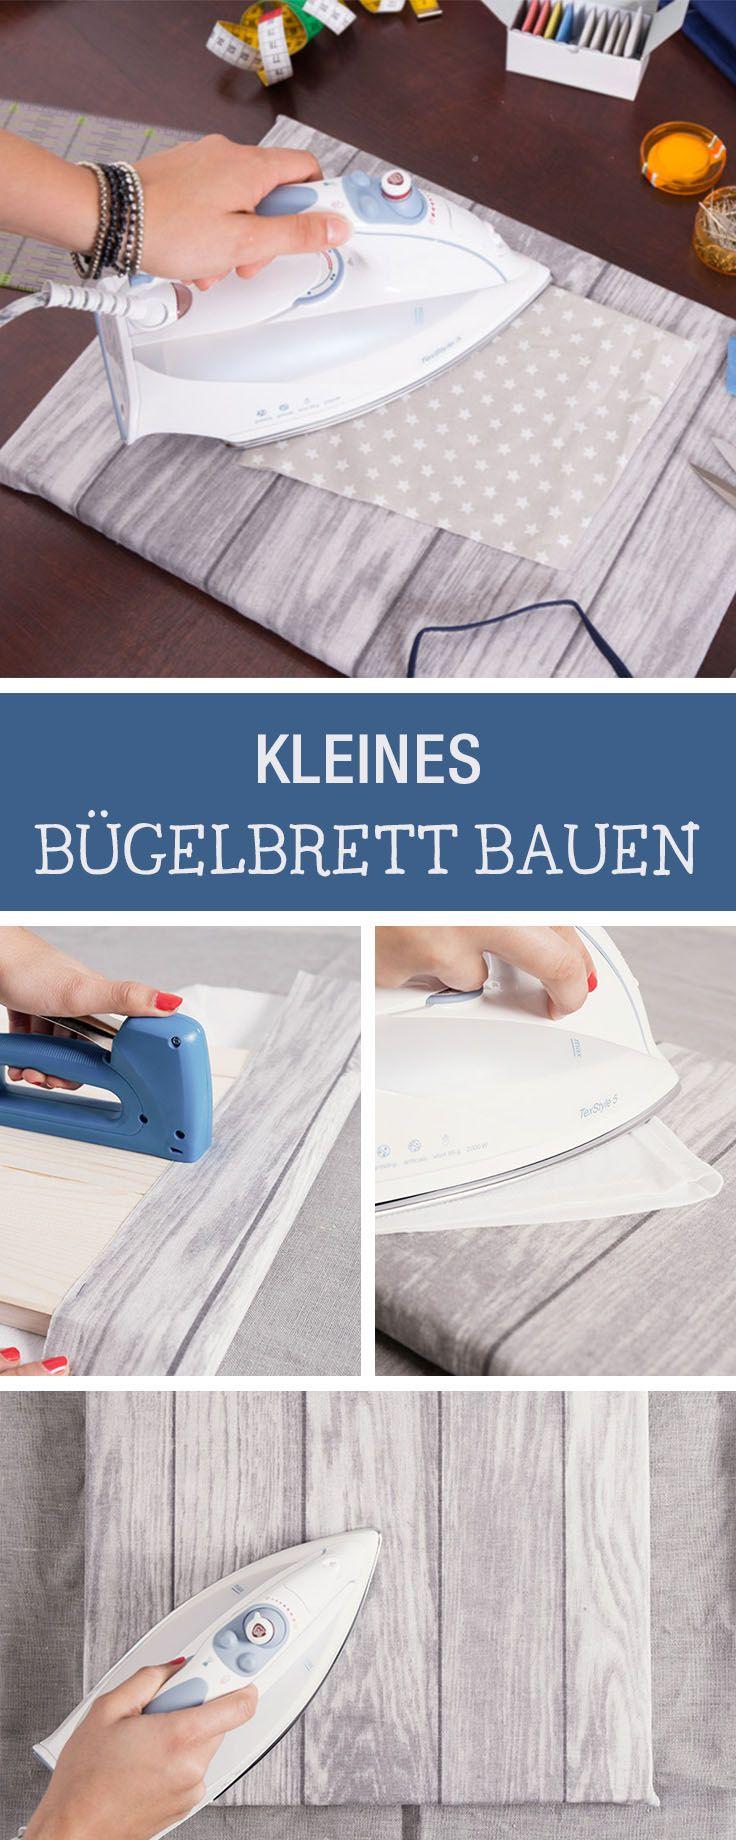 Möbel bauen: Bügelbrett selber bauen / diy idea: building an ironing board via DaWanda.com